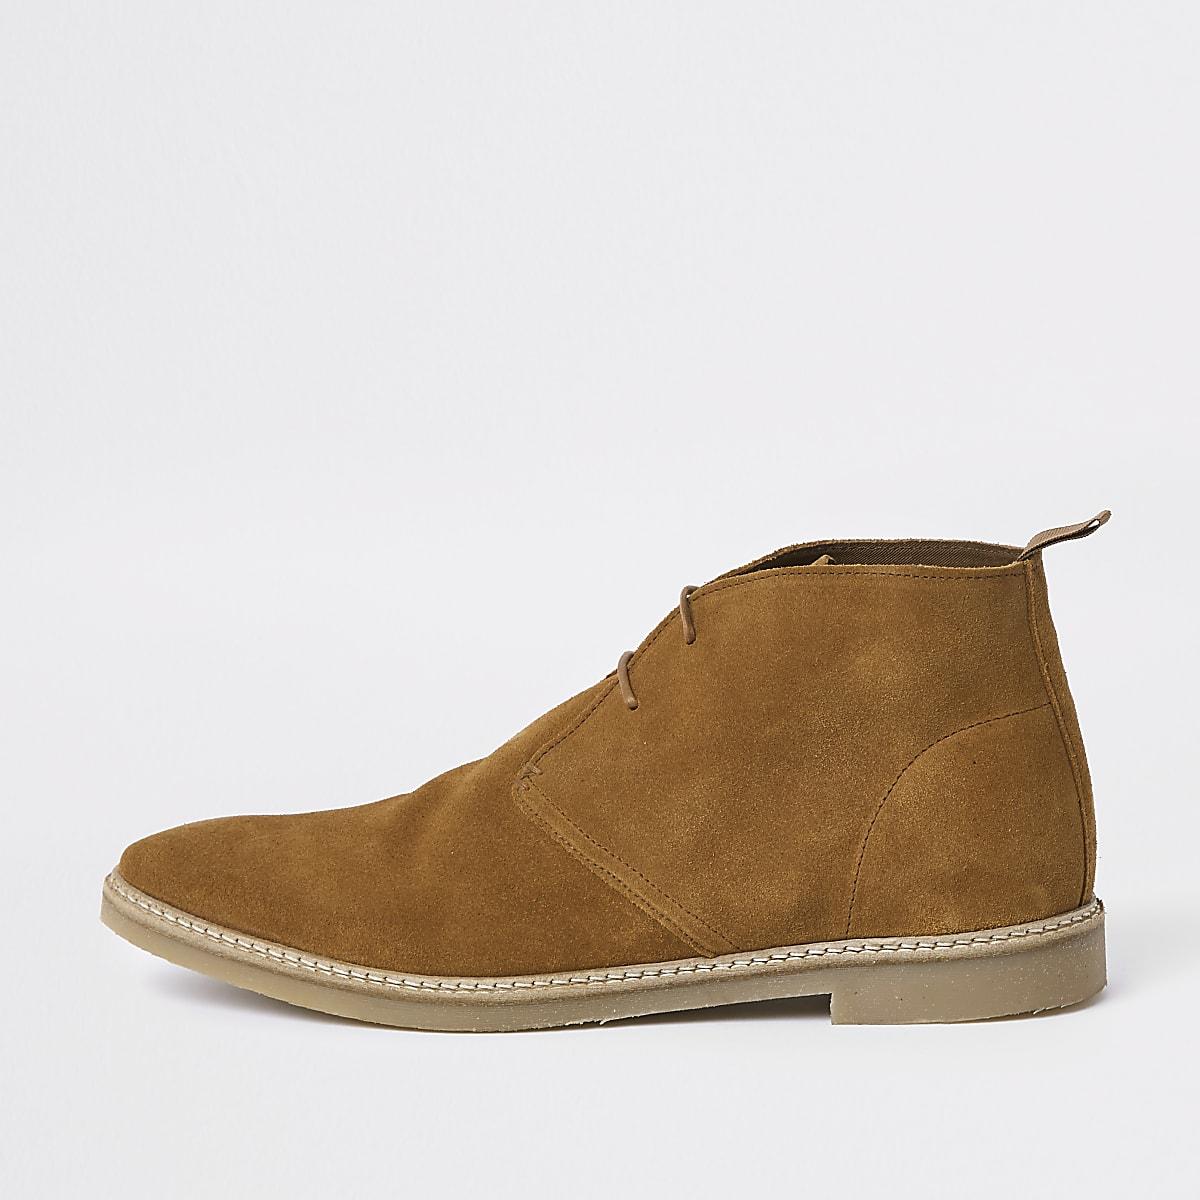 Tan suede eyelet desert boots